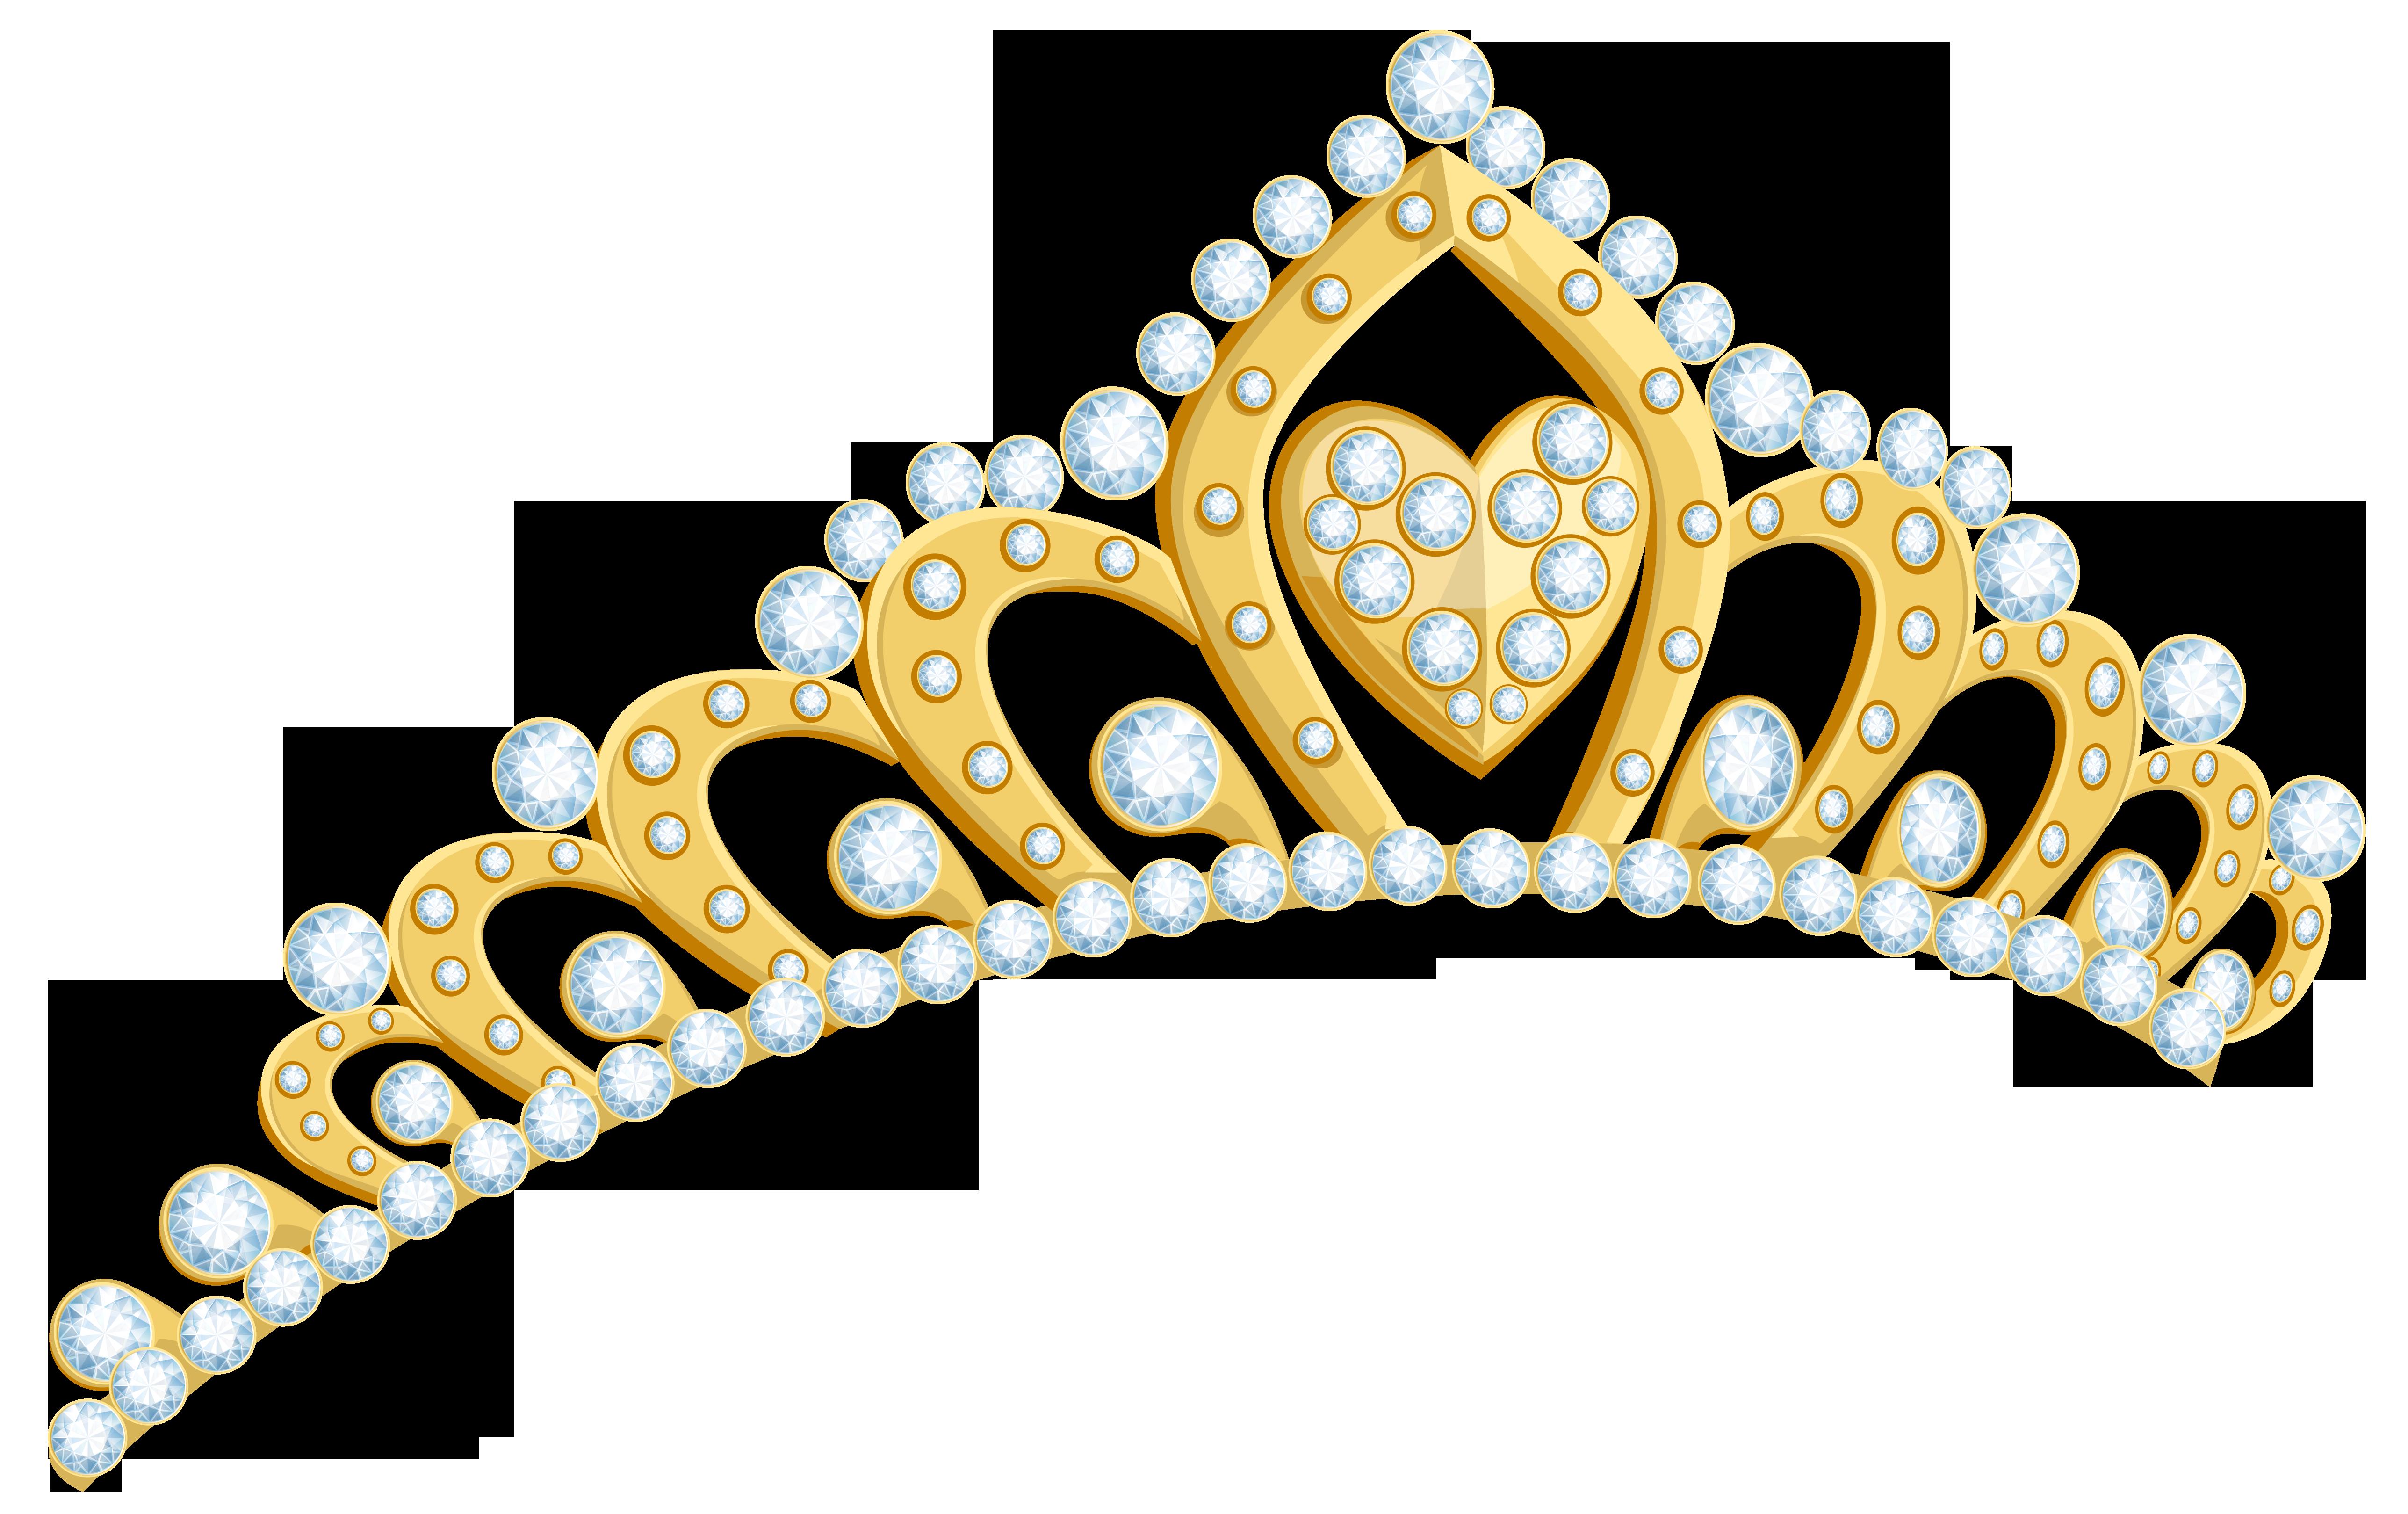 Pearl crown cartoon clipart clip art transparent Golden Tiara PNG Clipart Image | Gallery Yopriceville - High ... clip art transparent